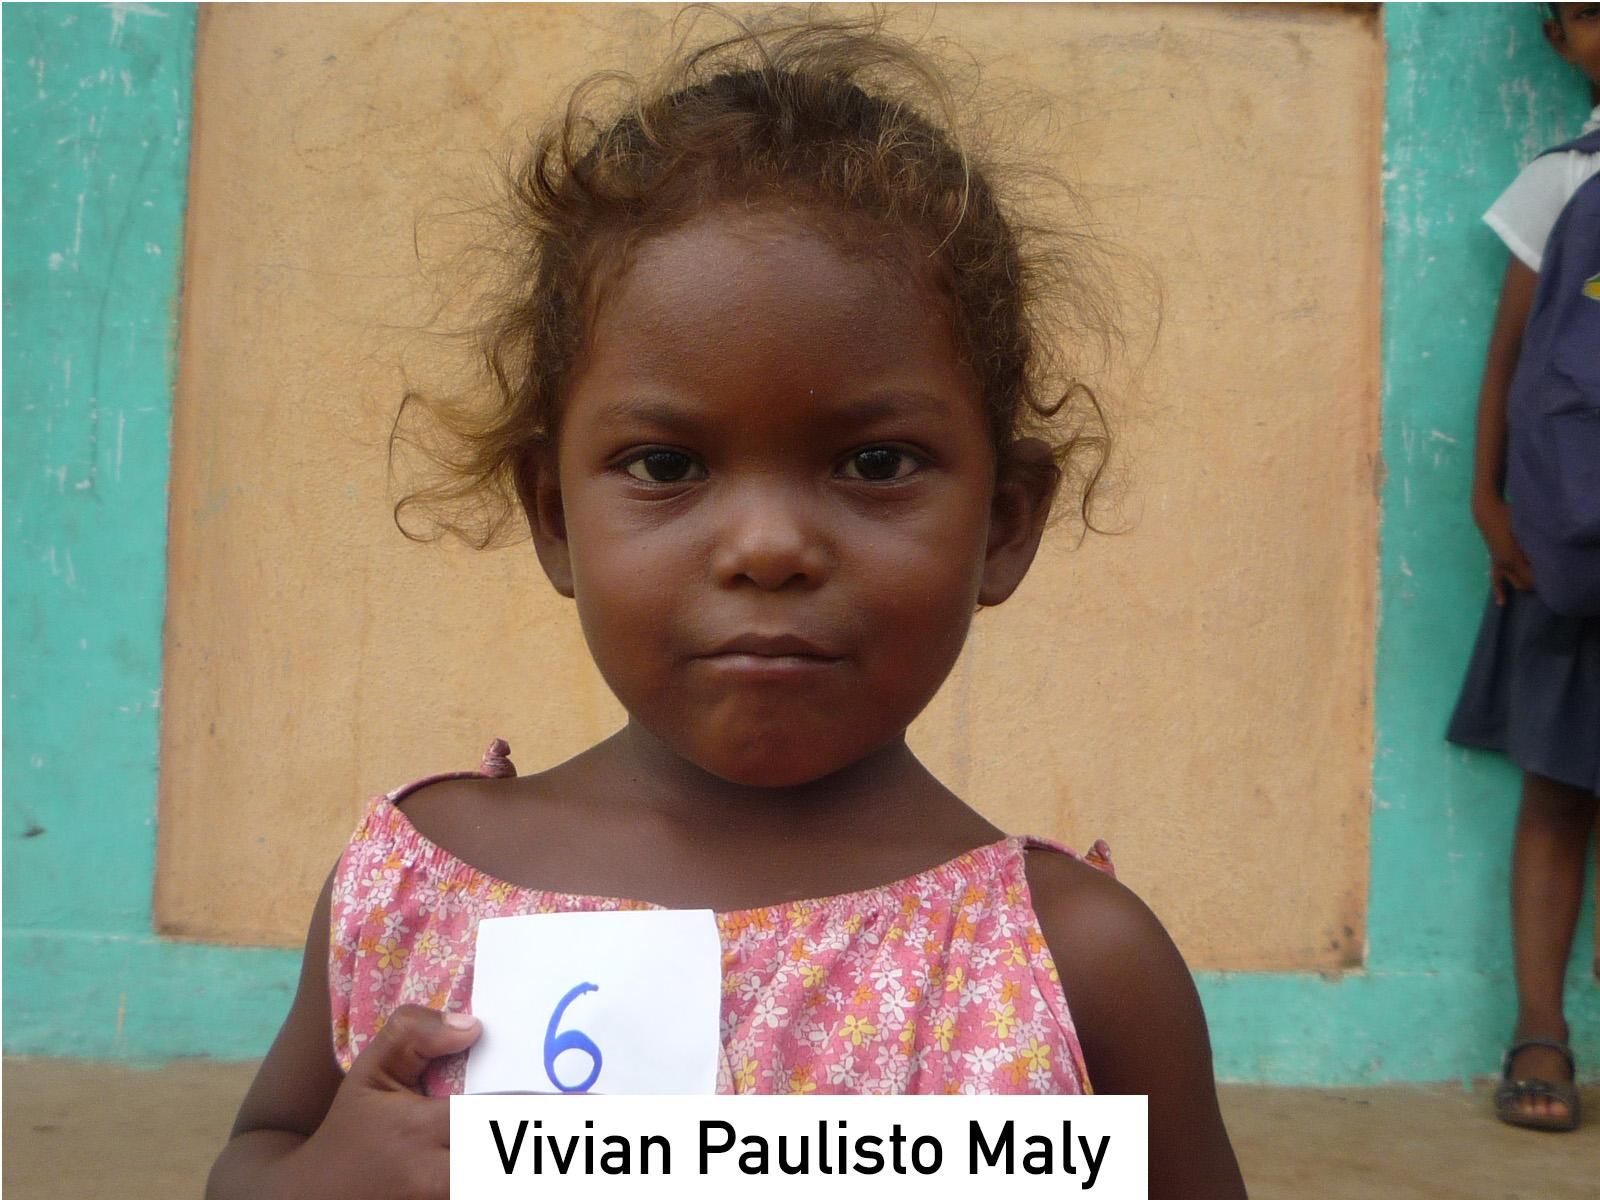 006 - Vivian Paulisto Maly.jpg